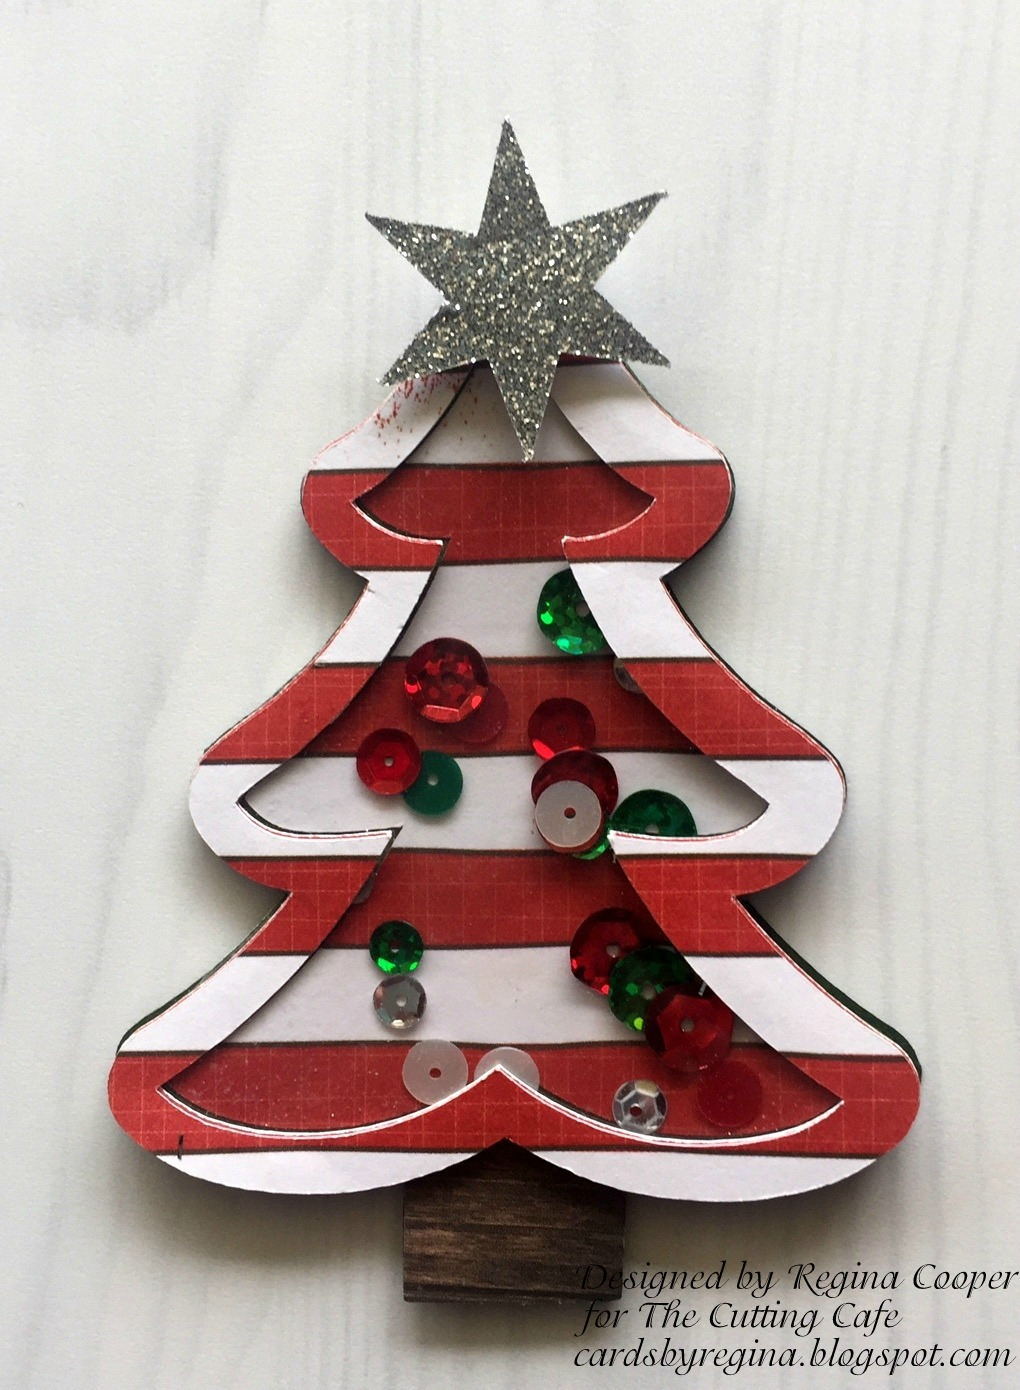 cardsregina: christmas tree shaker card in shadow box